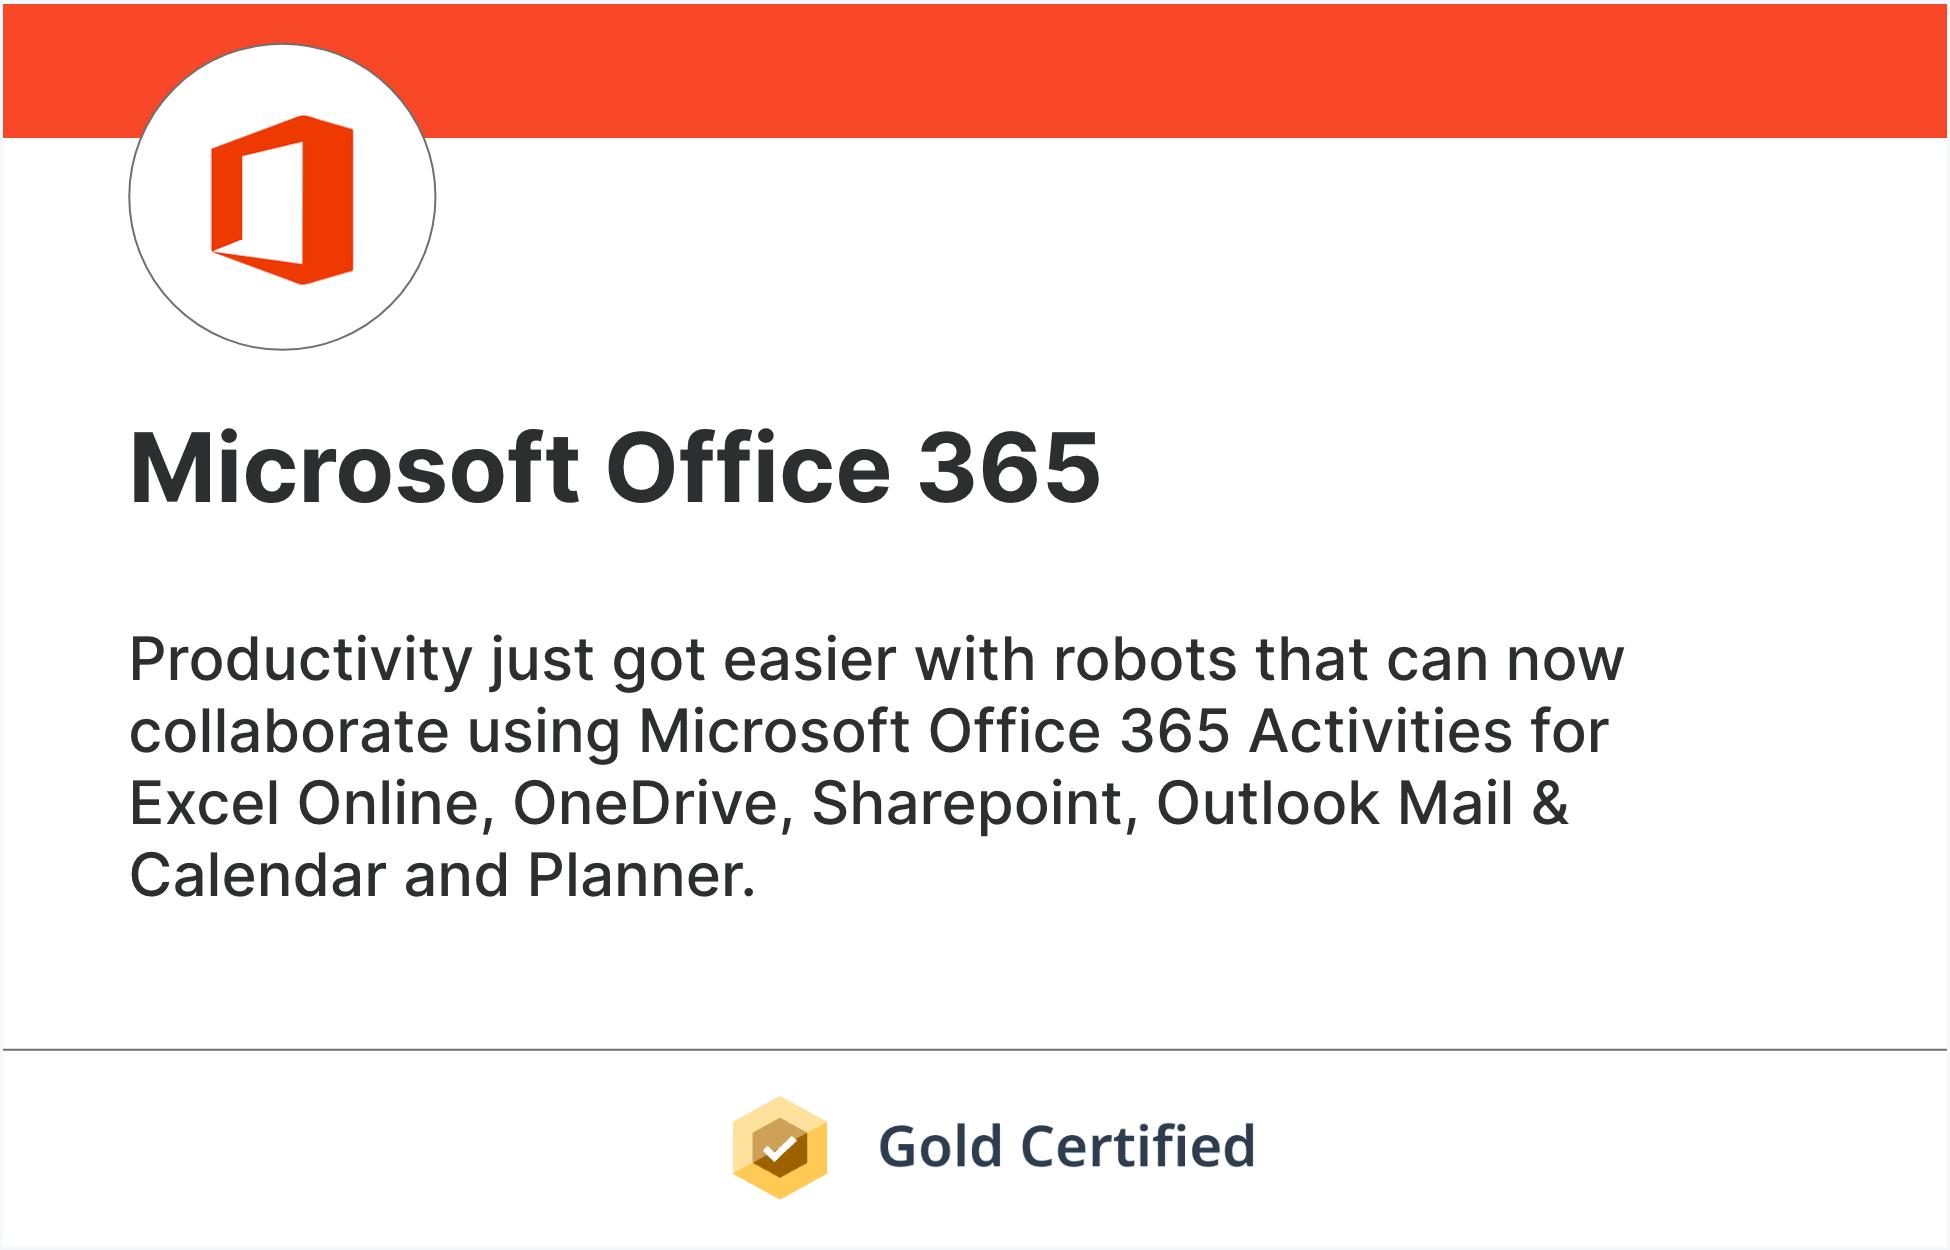 microsoft-office-365